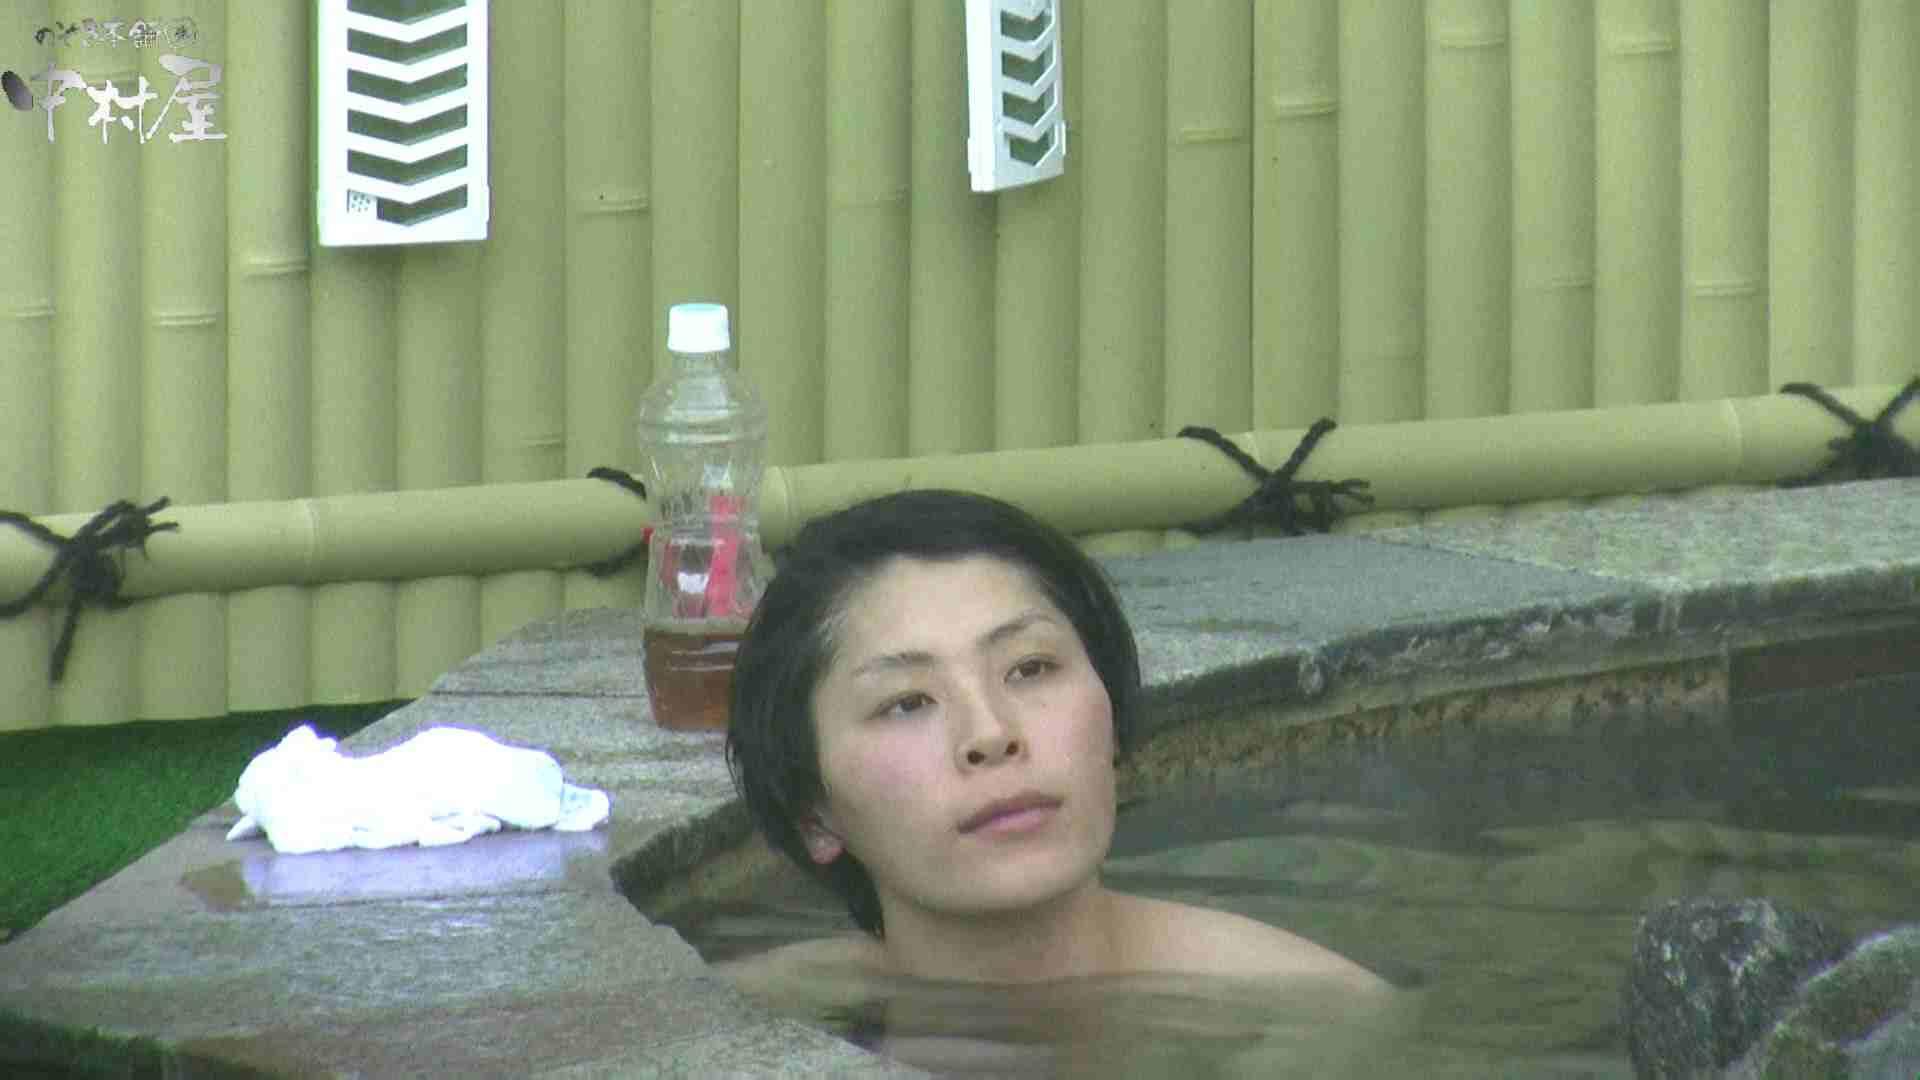 Aquaな露天風呂Vol.970 OL  59連発 9